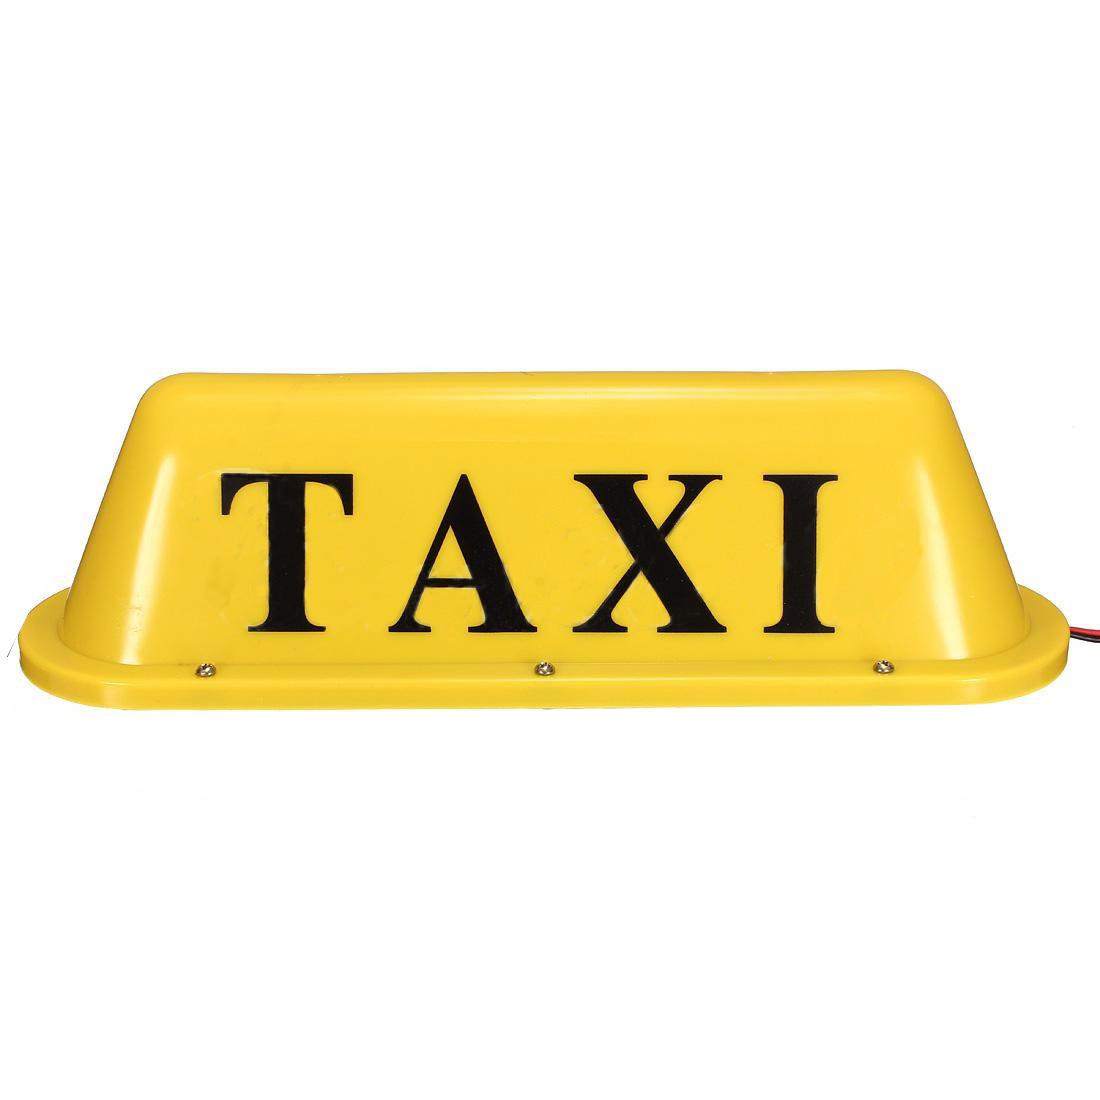 Кабина на крыше Знак Легкий Такси Магнитный LED Лампа Водонепроницаемы 12V Желтый